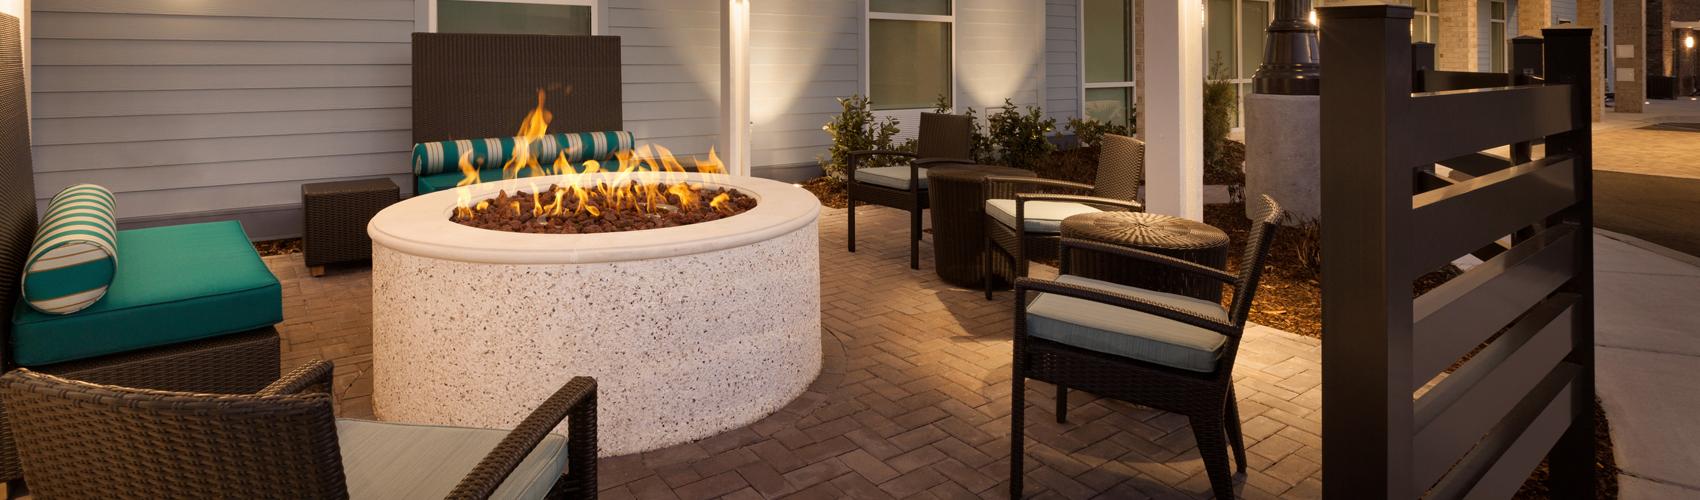 Home2 Suites by Hilton Mt. Pleasant Charleston